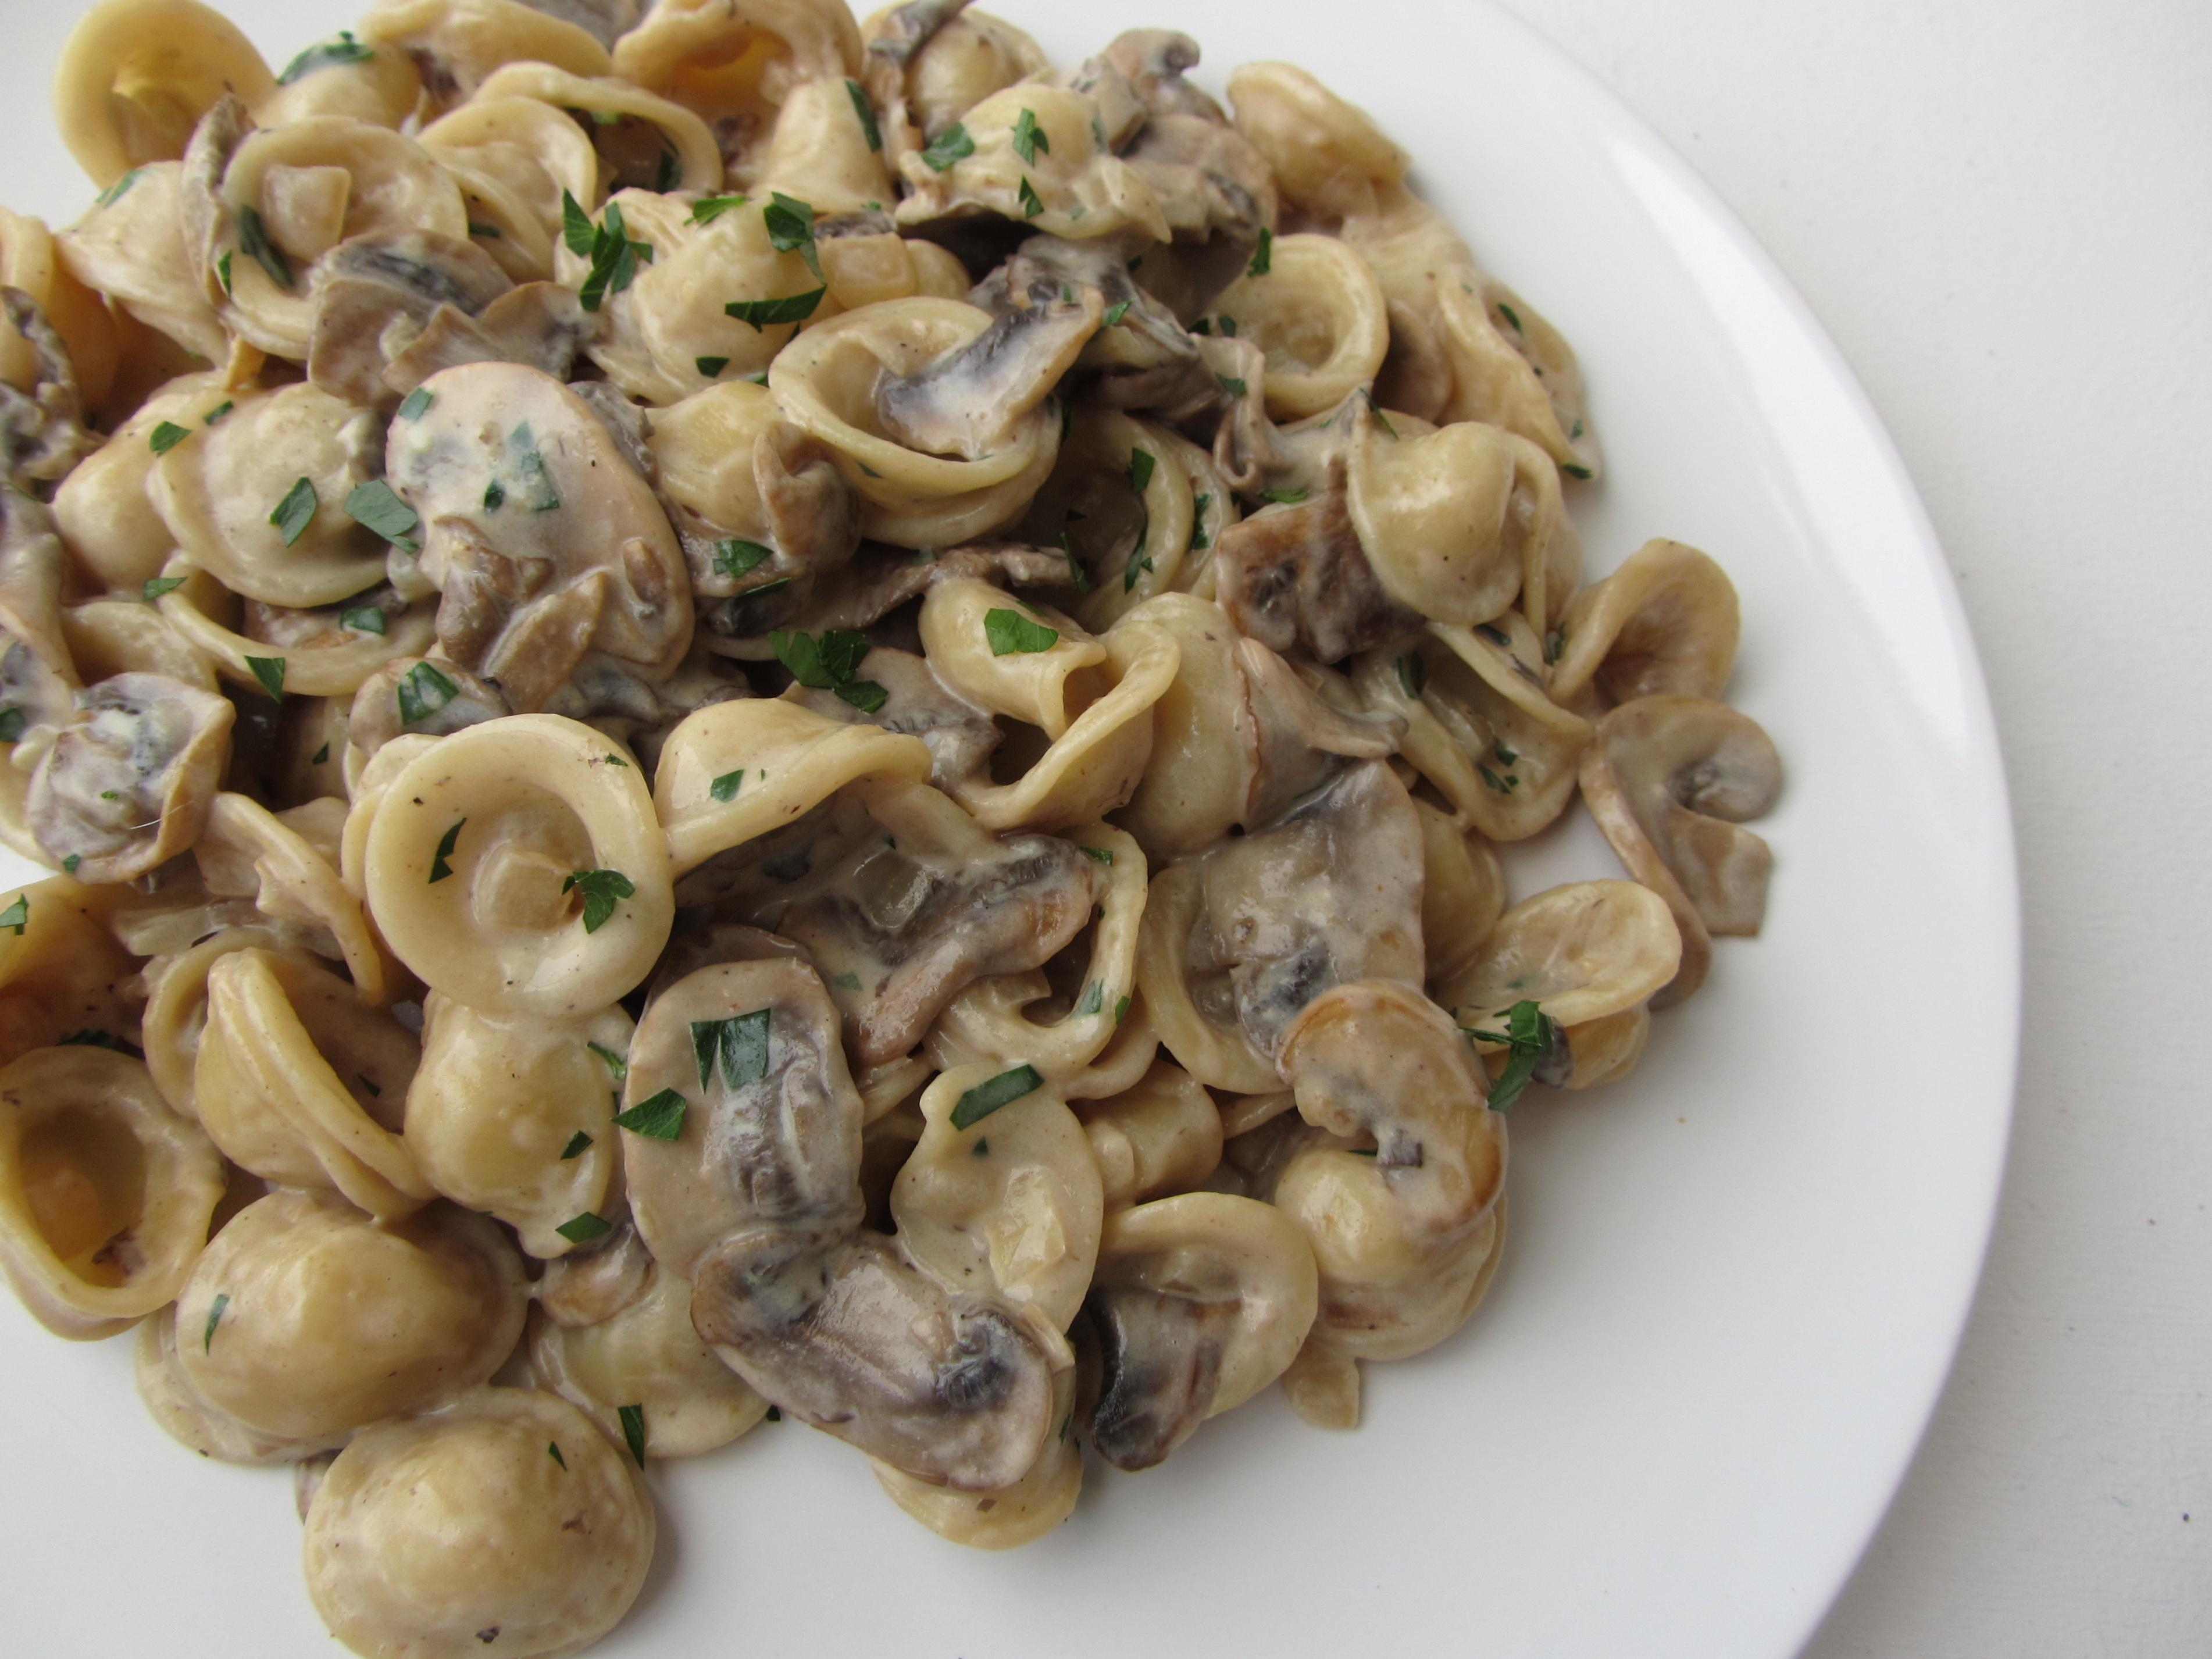 Orecchiette Pasta in Creamy Mushroom Sauce | I'm Not A Cook